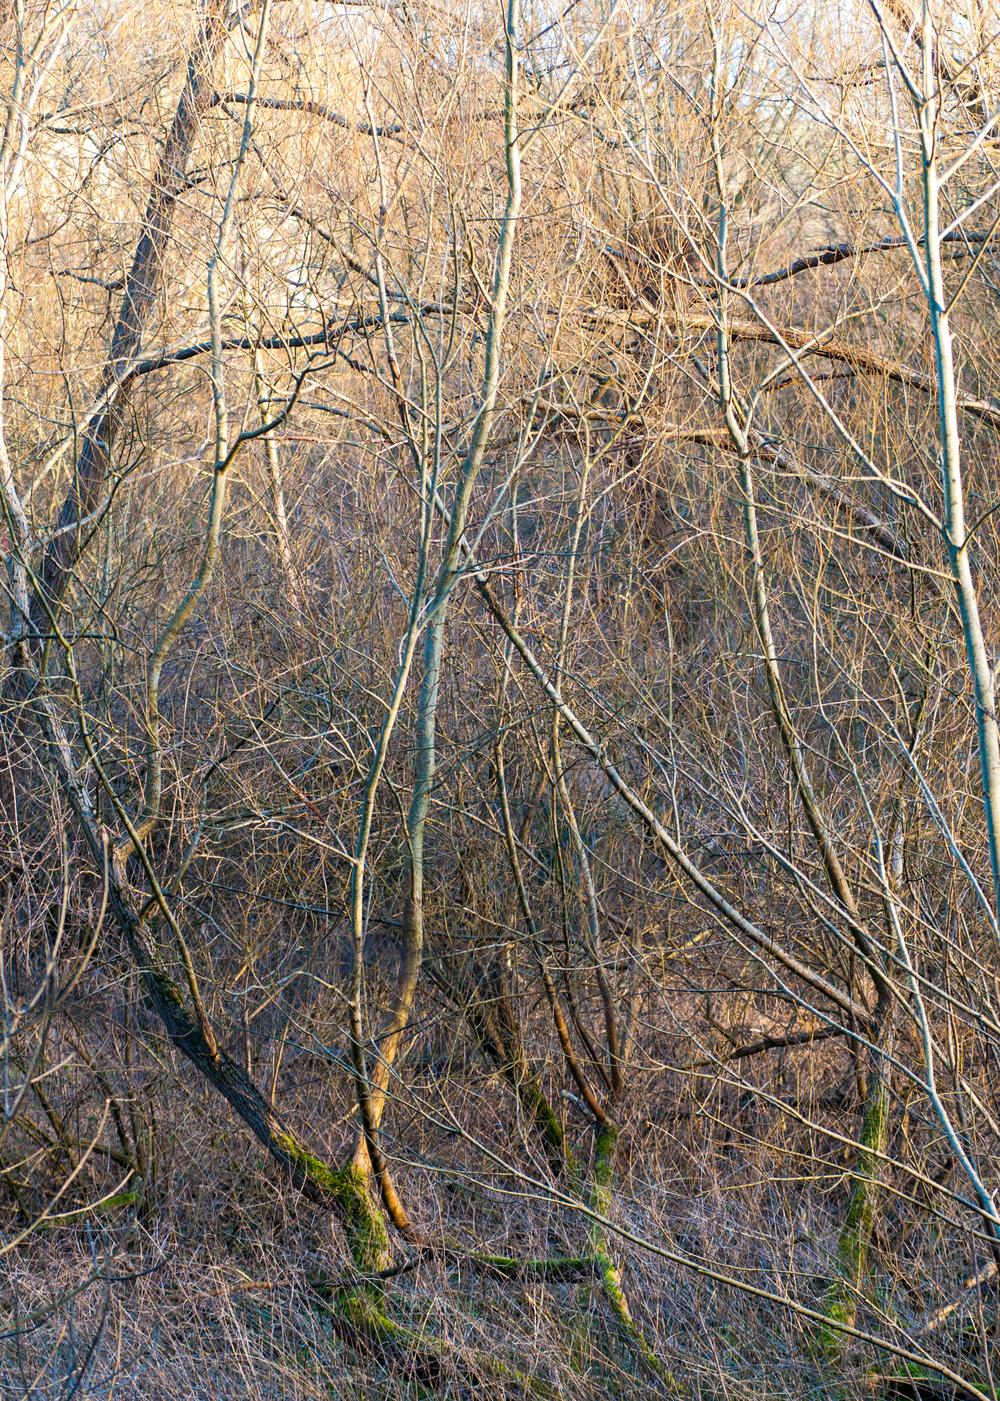 Tangled trees in a wood.jpg